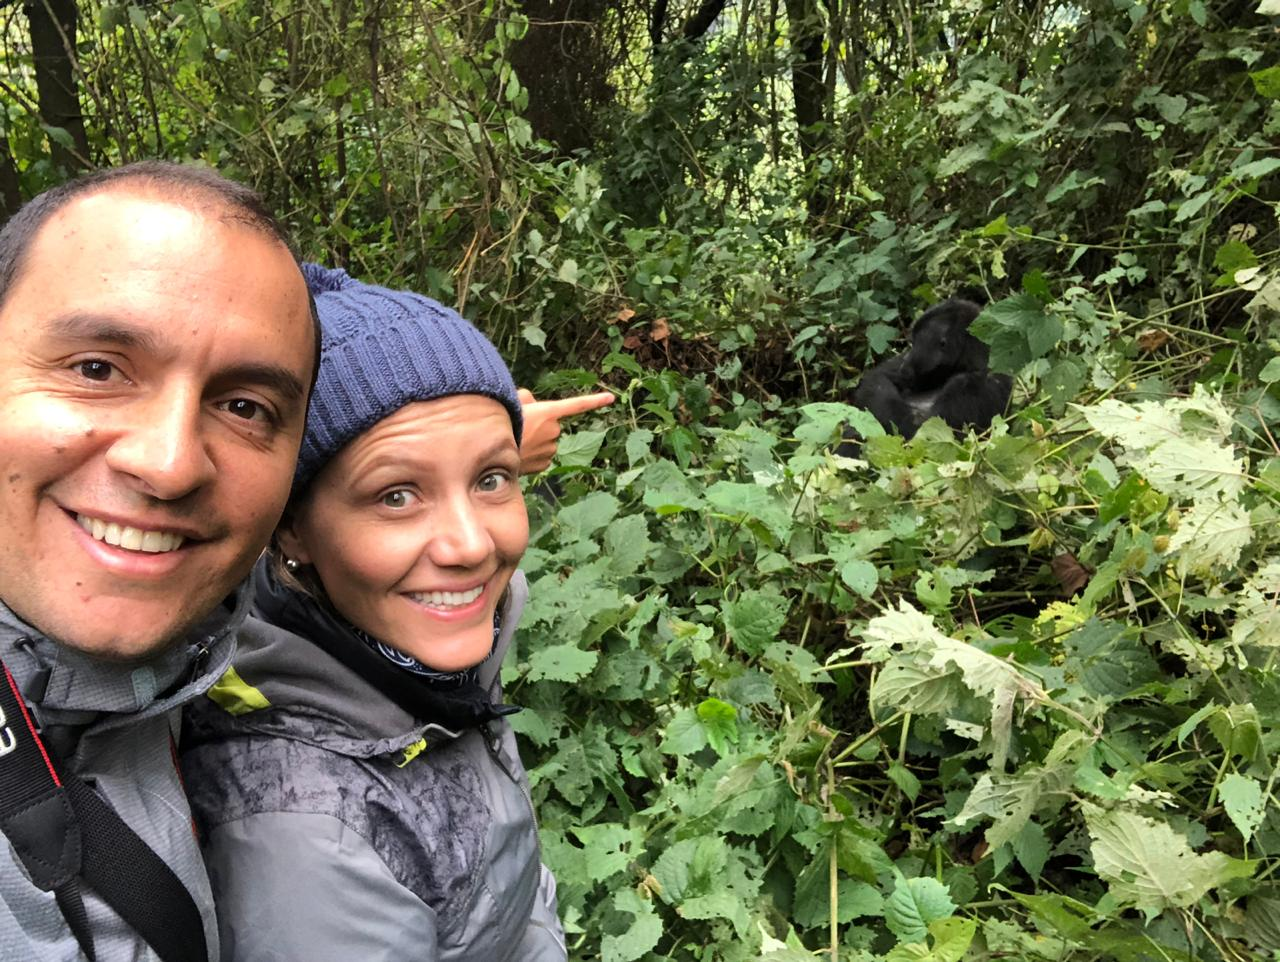 Epic Gorilla encounter